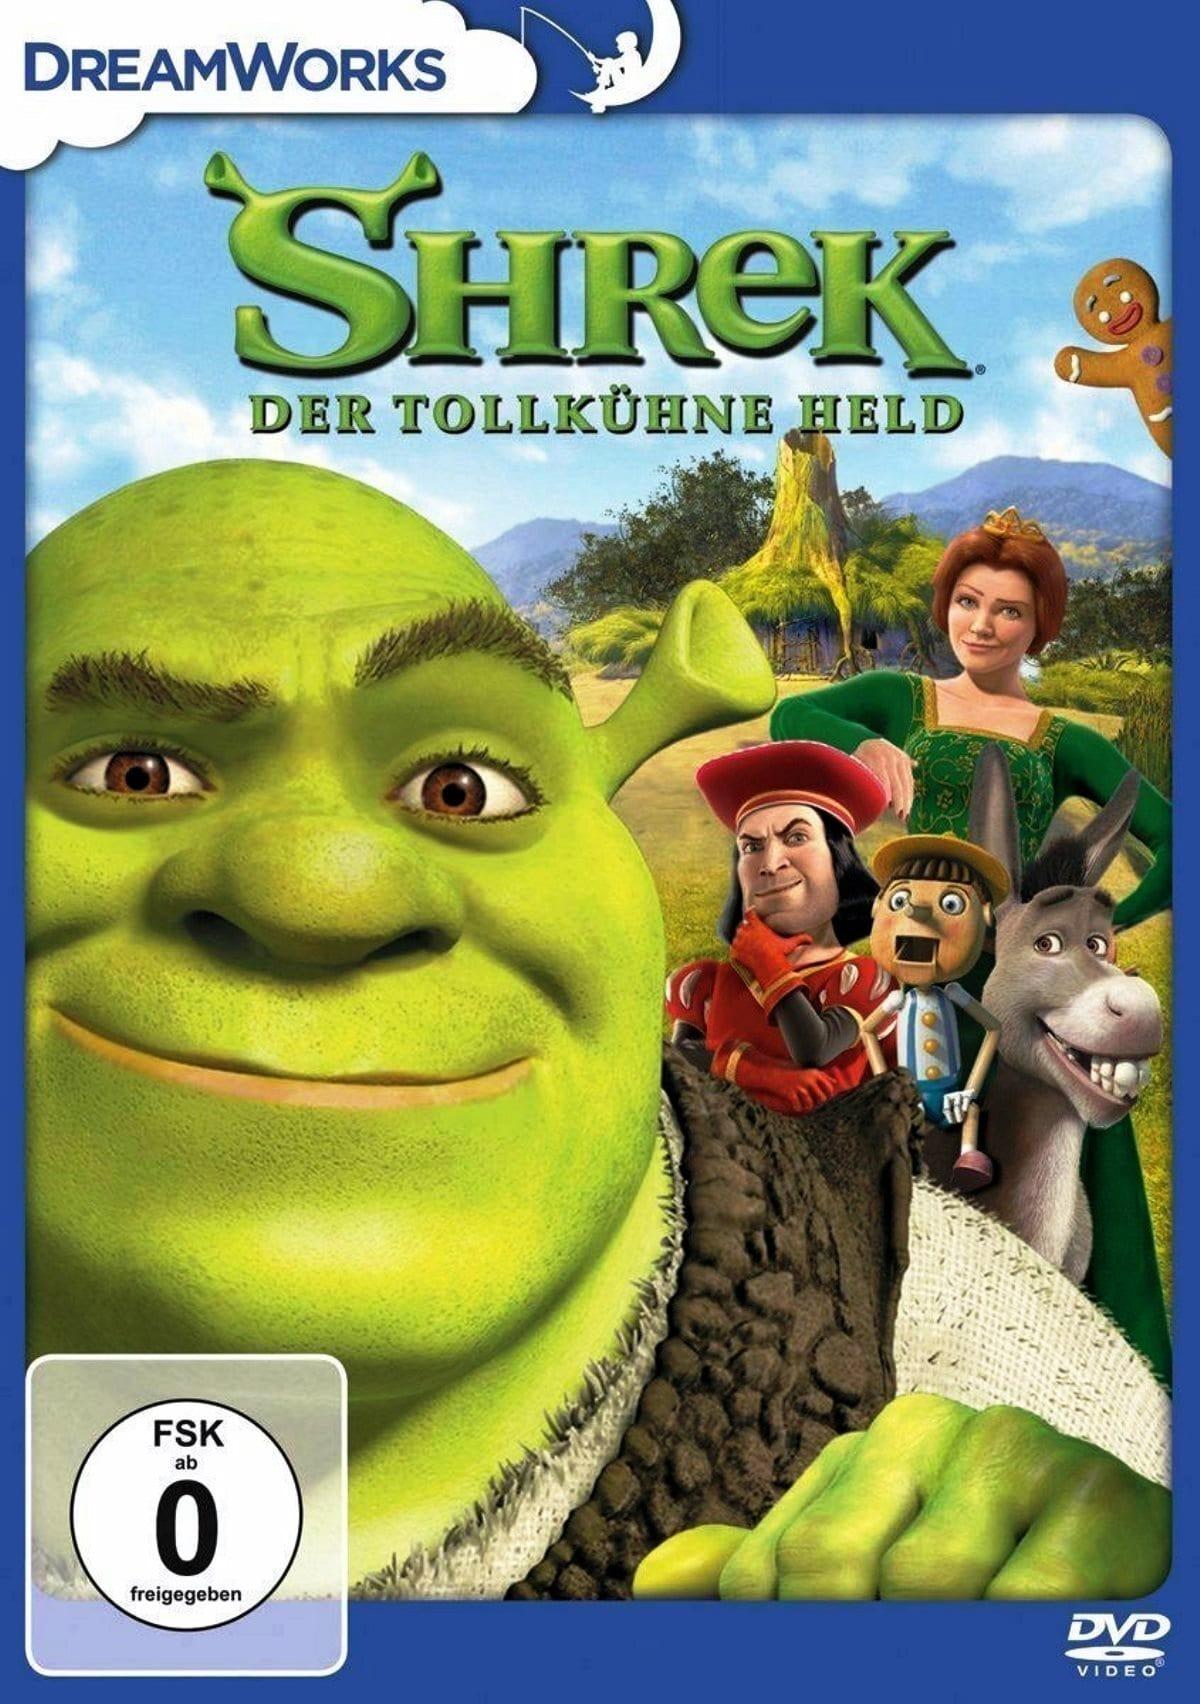 Watch Shrek (2001) Full Movie Streaming Online